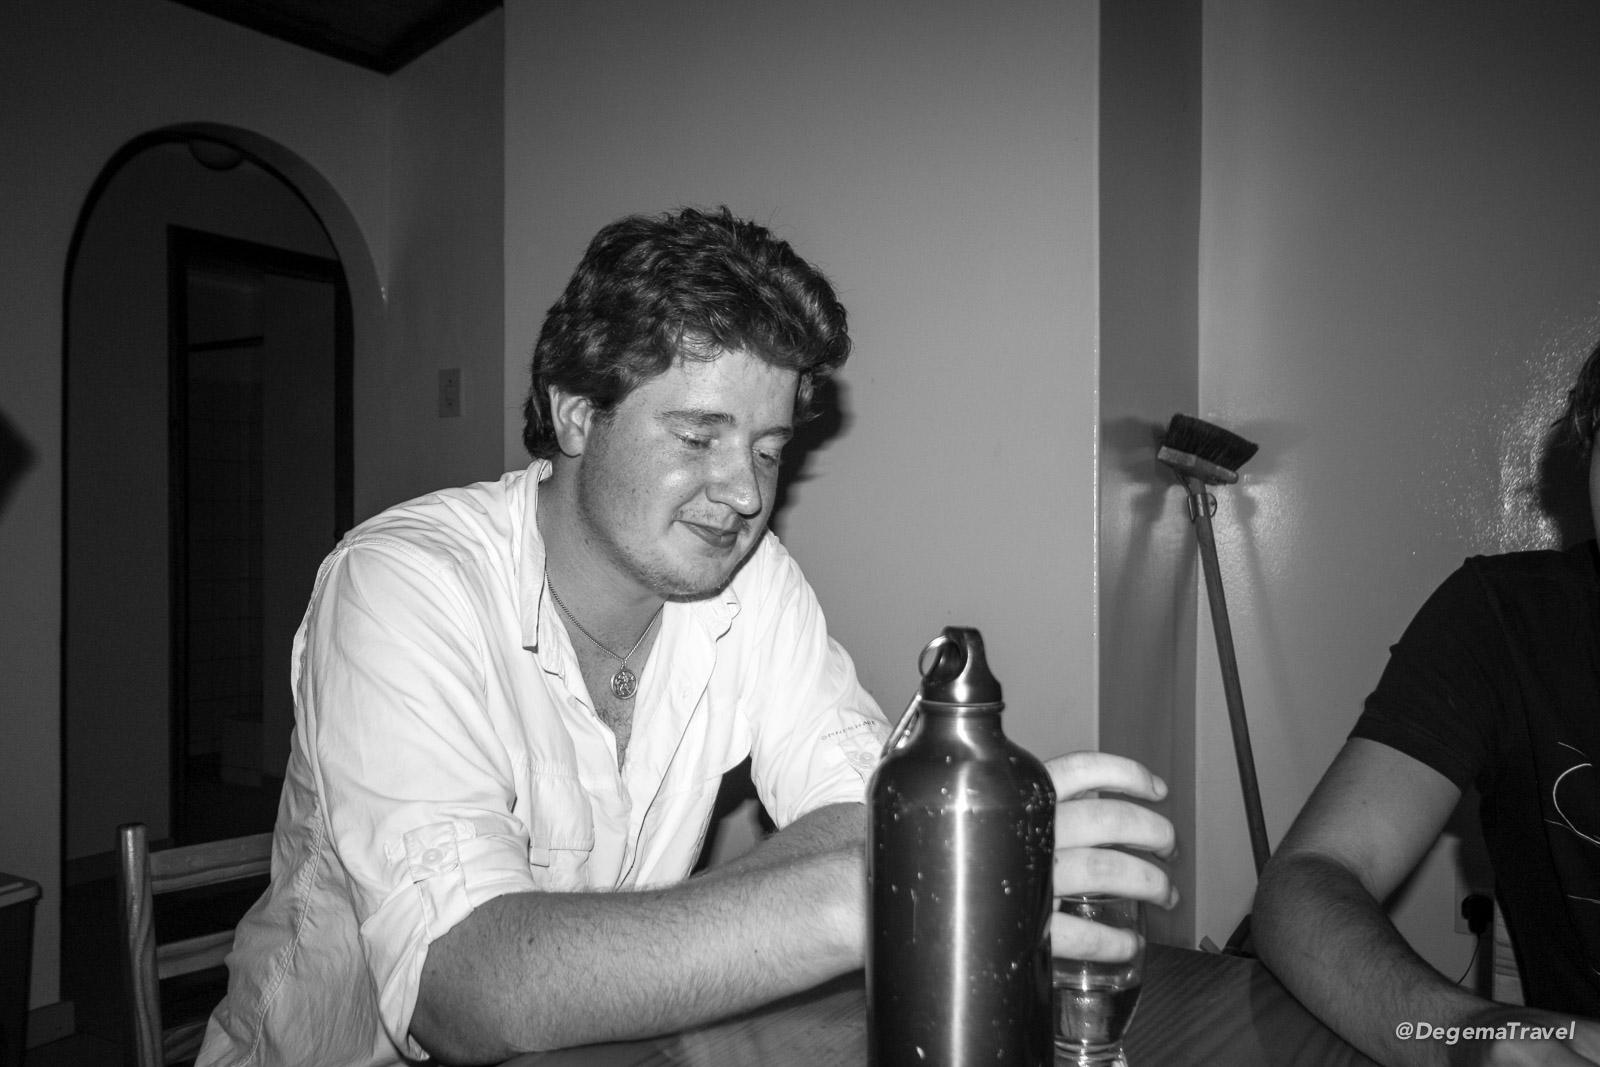 Having a drink at Swakopmund Municipal Restcamp, Namibia